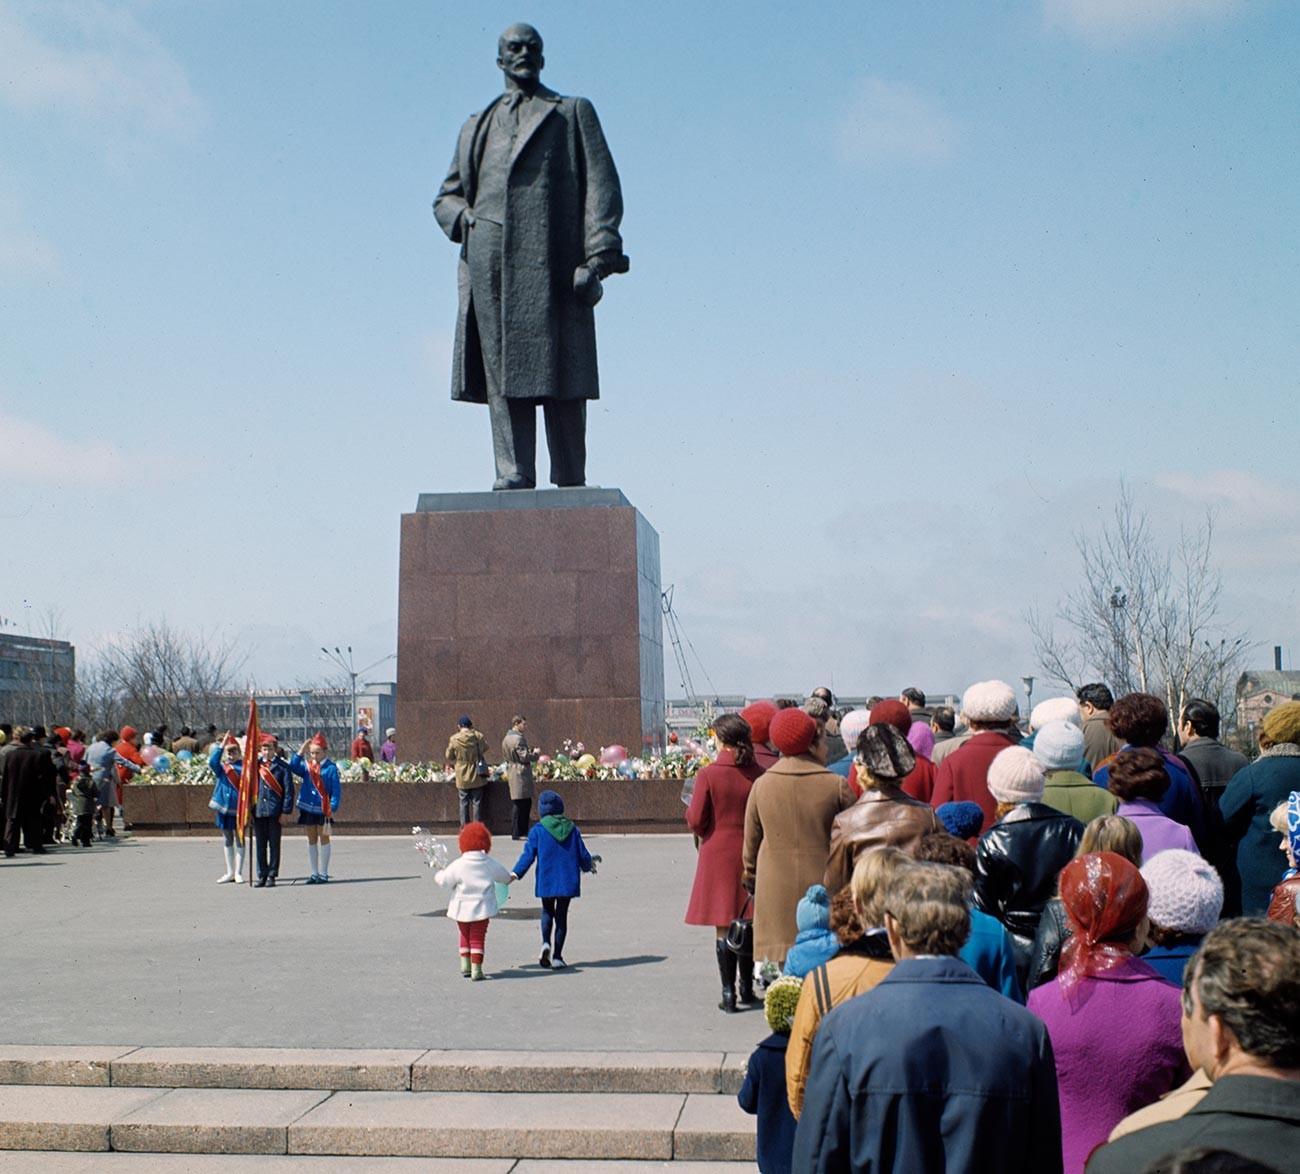 Споменик В. И. Лењину, Јужно-Сахалинск.